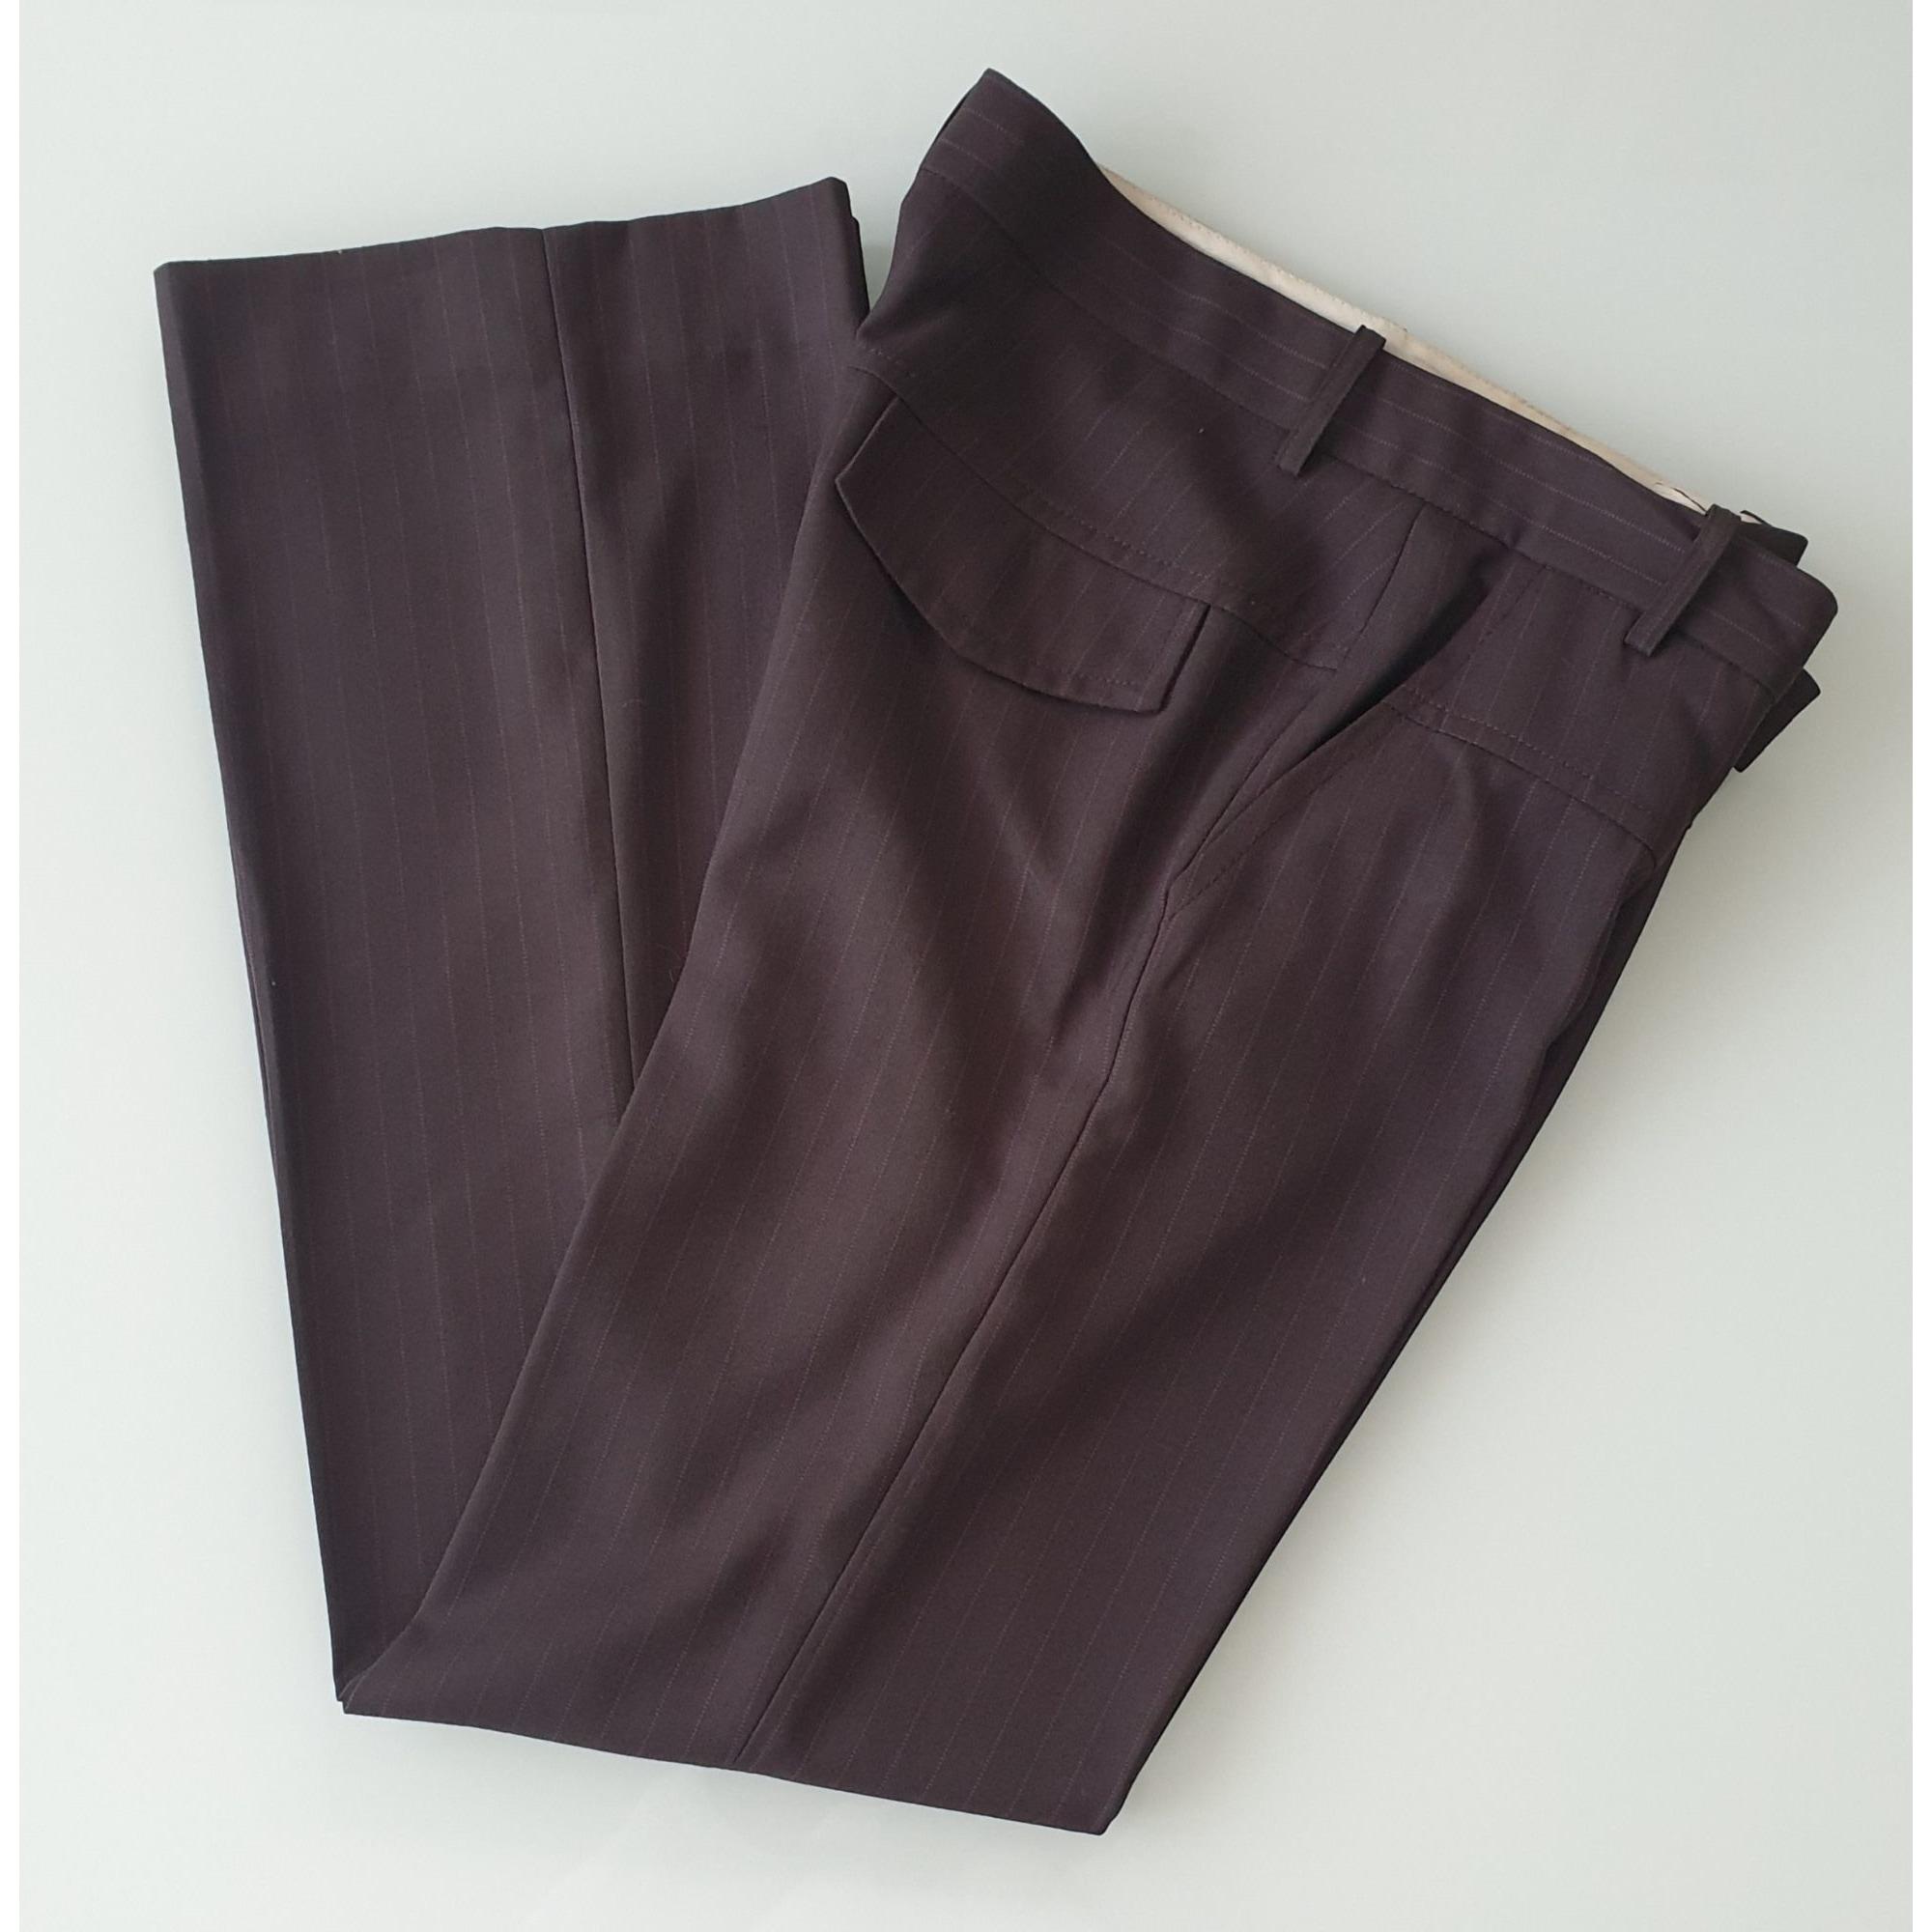 Pantalon droit MAJE Marron